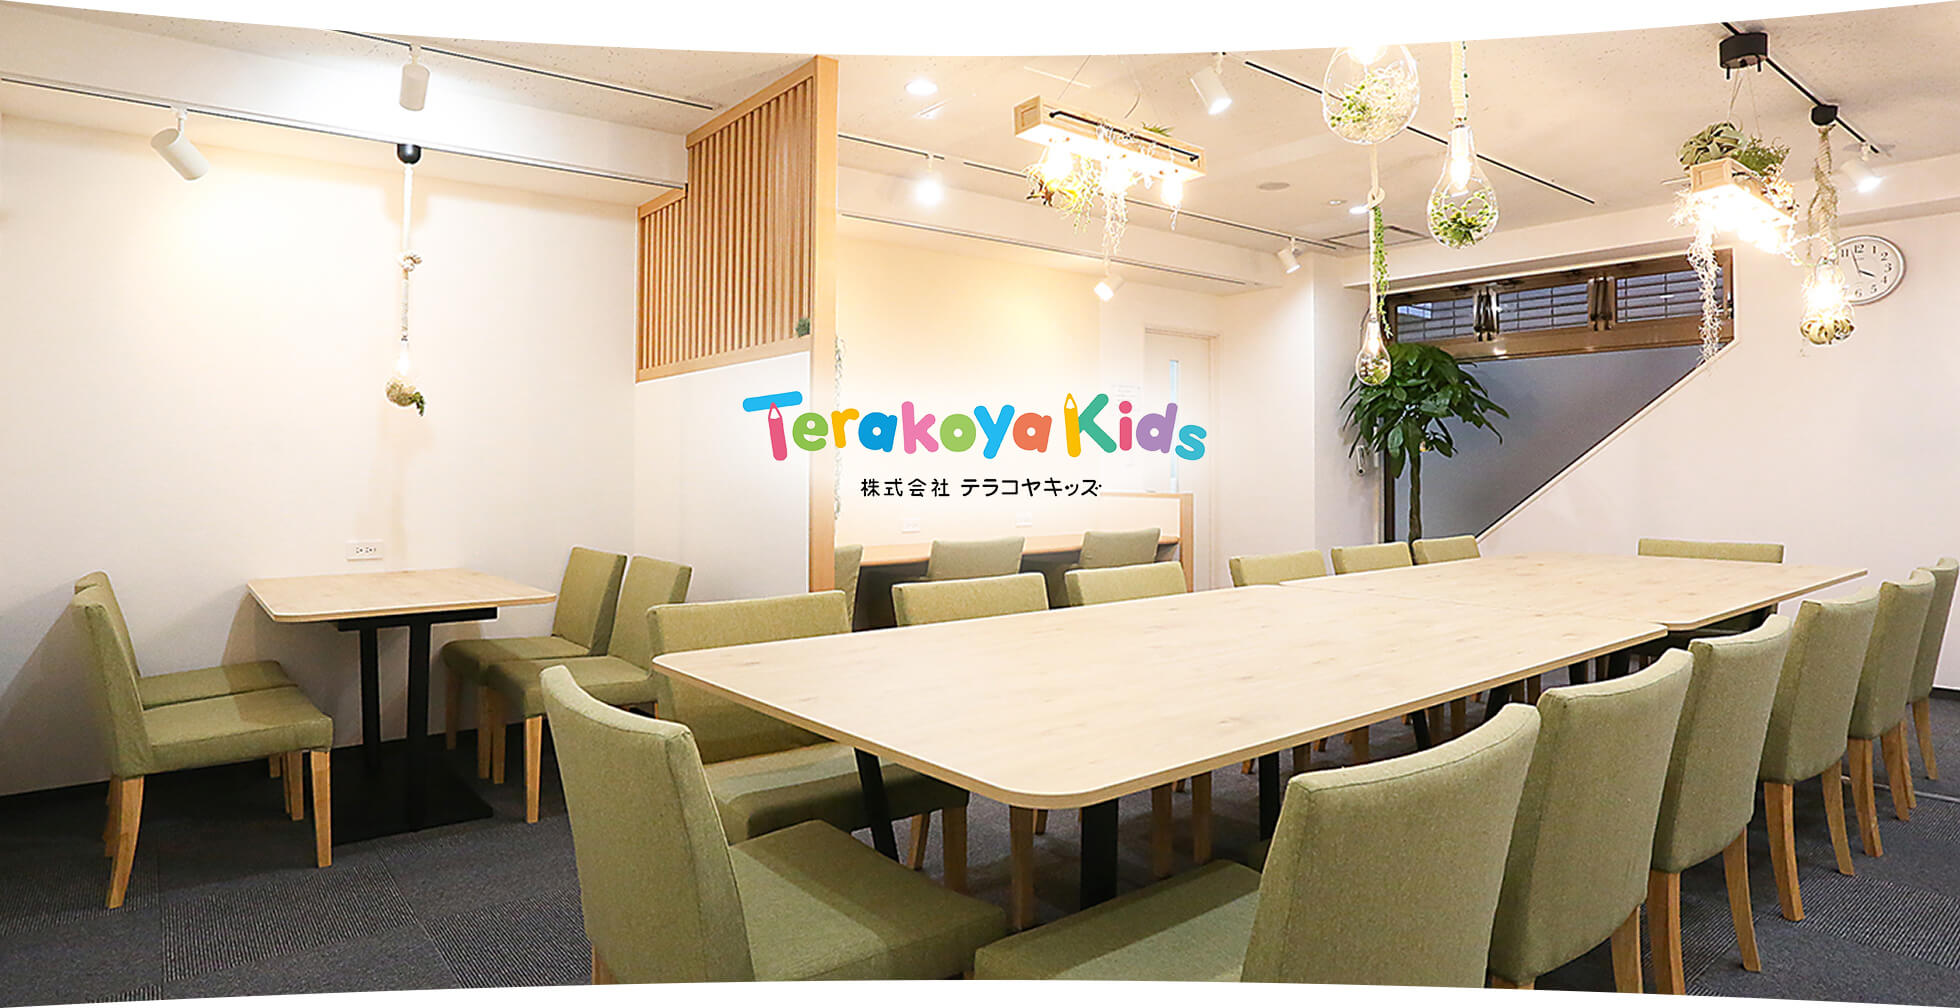 Terakoya Kids